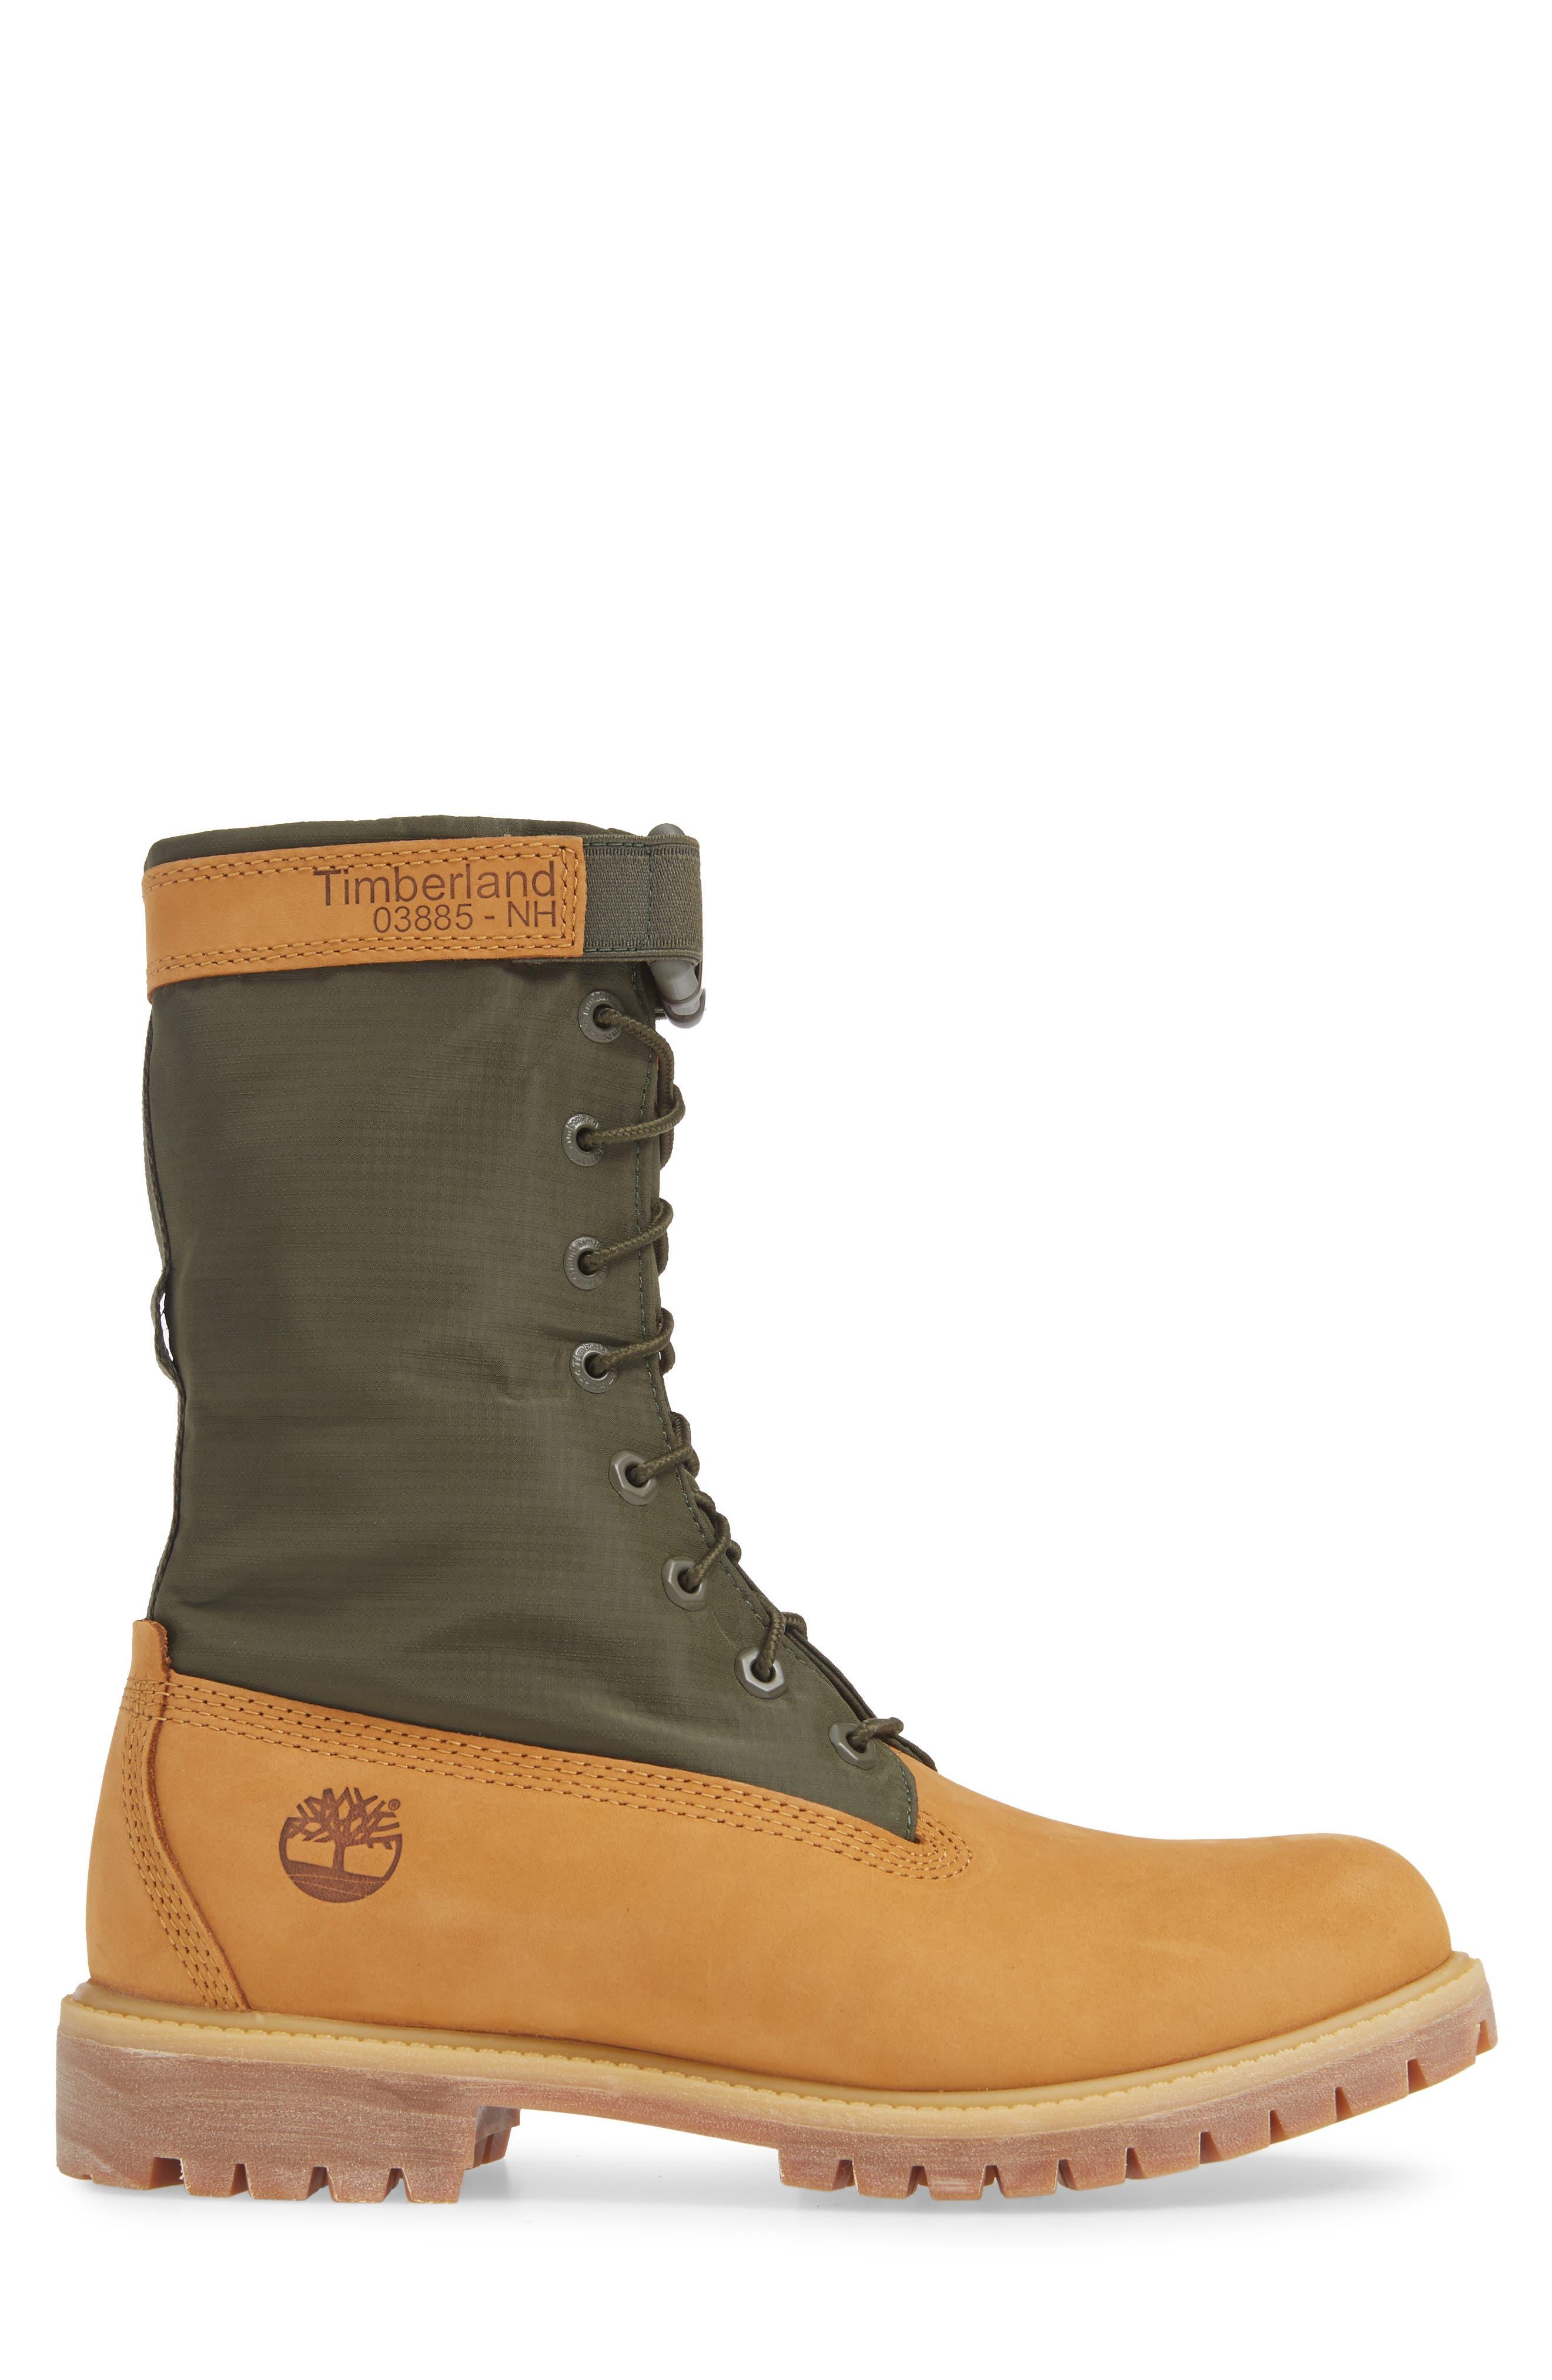 TIMBERLAND,                             Premium Gaiter Plain Toe Boot,                             Alternate thumbnail 3, color,                             231